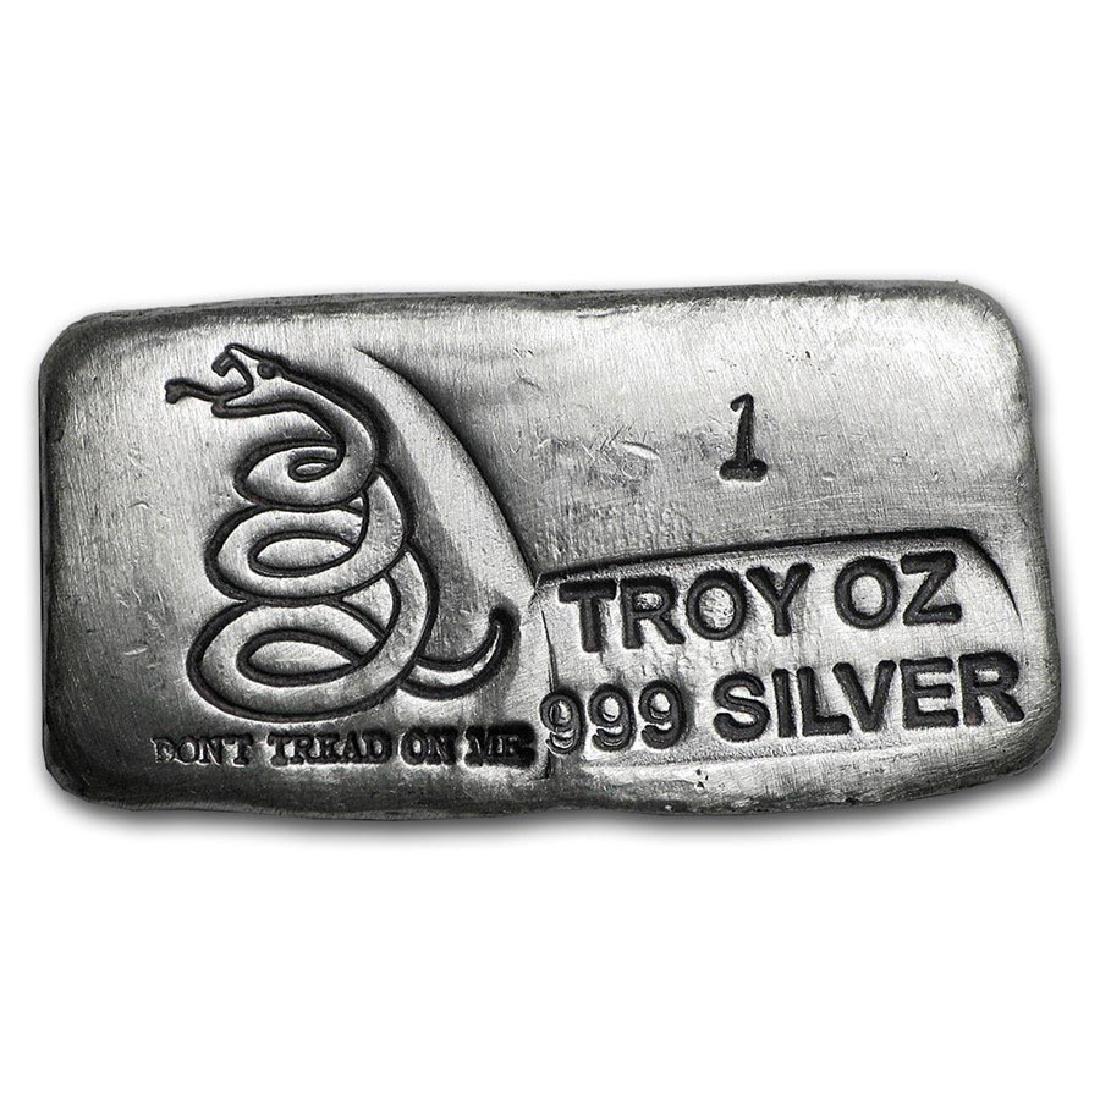 1 oz Silver Bar - Don't Tread On Me (PG&G)